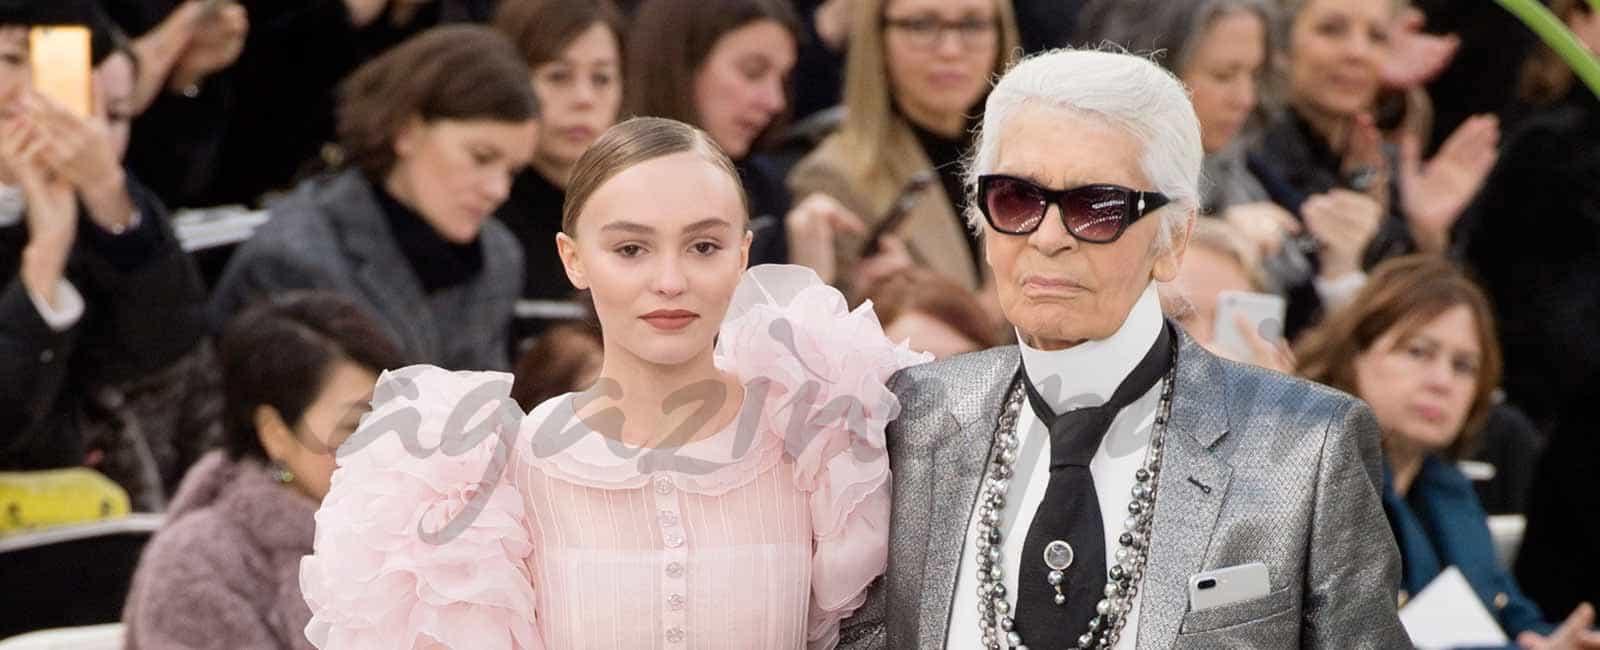 París Fashion Week 2017: Chanel-Alta Costura